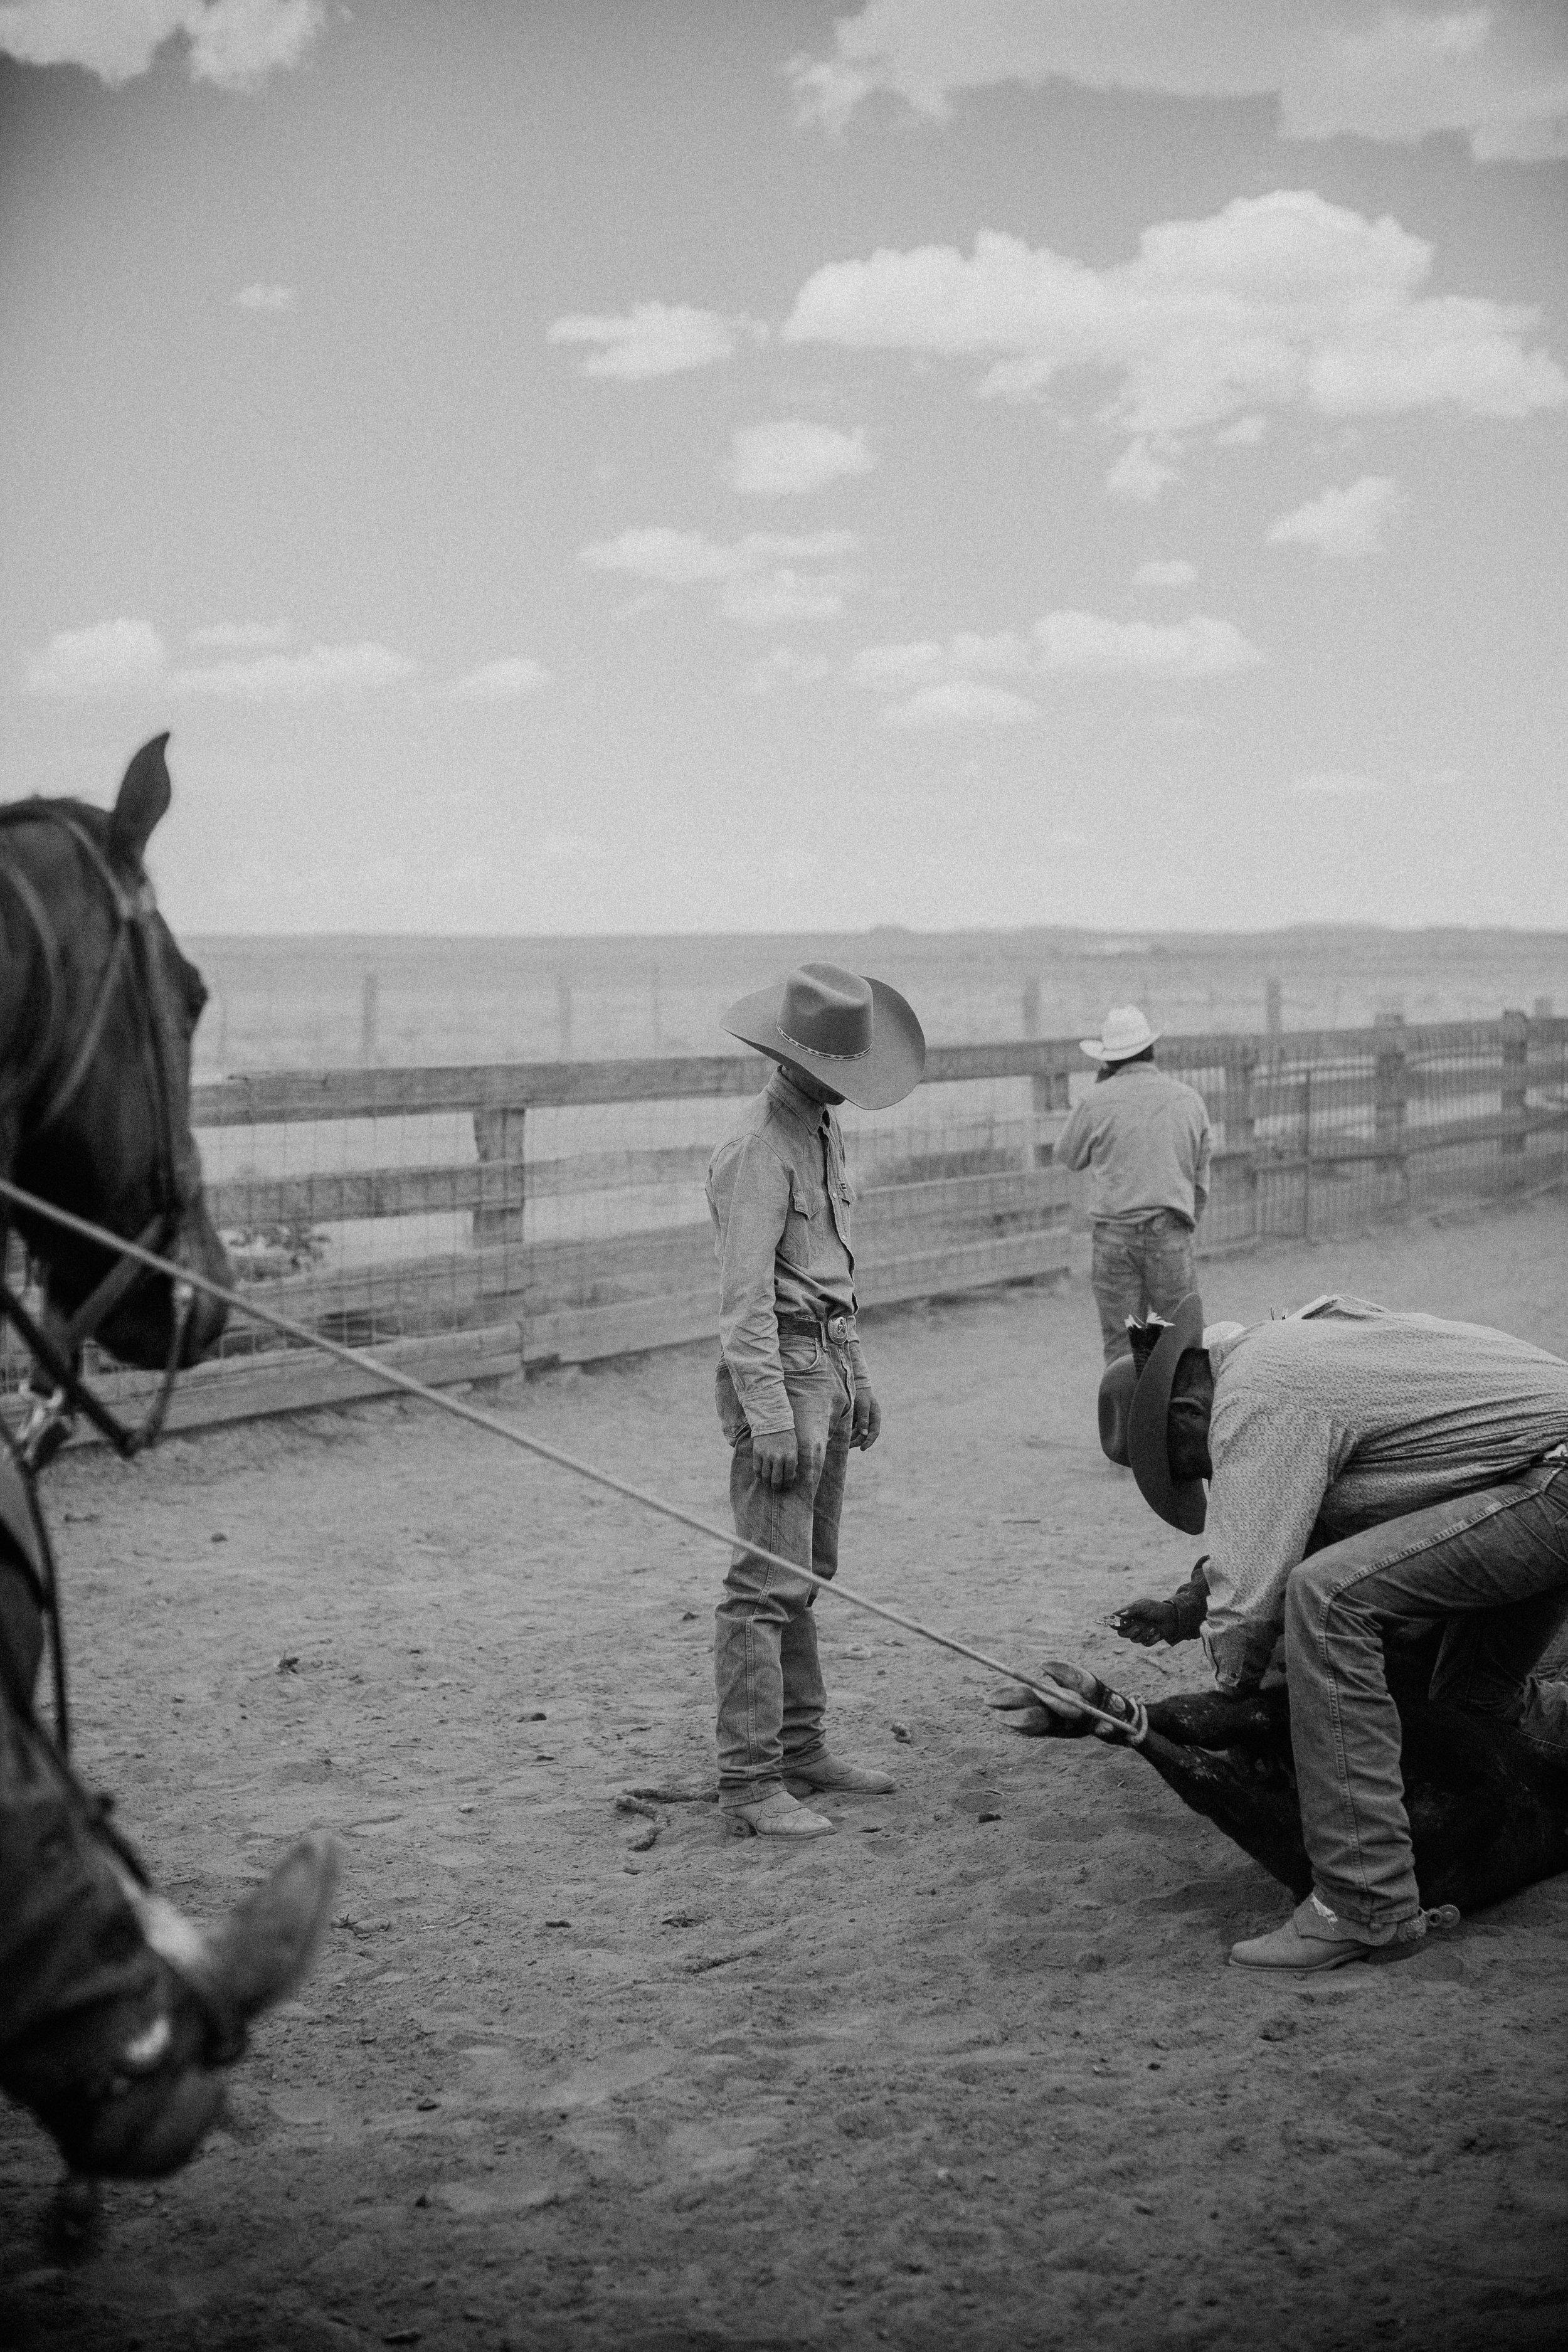 cattle-drive-8662.jpg